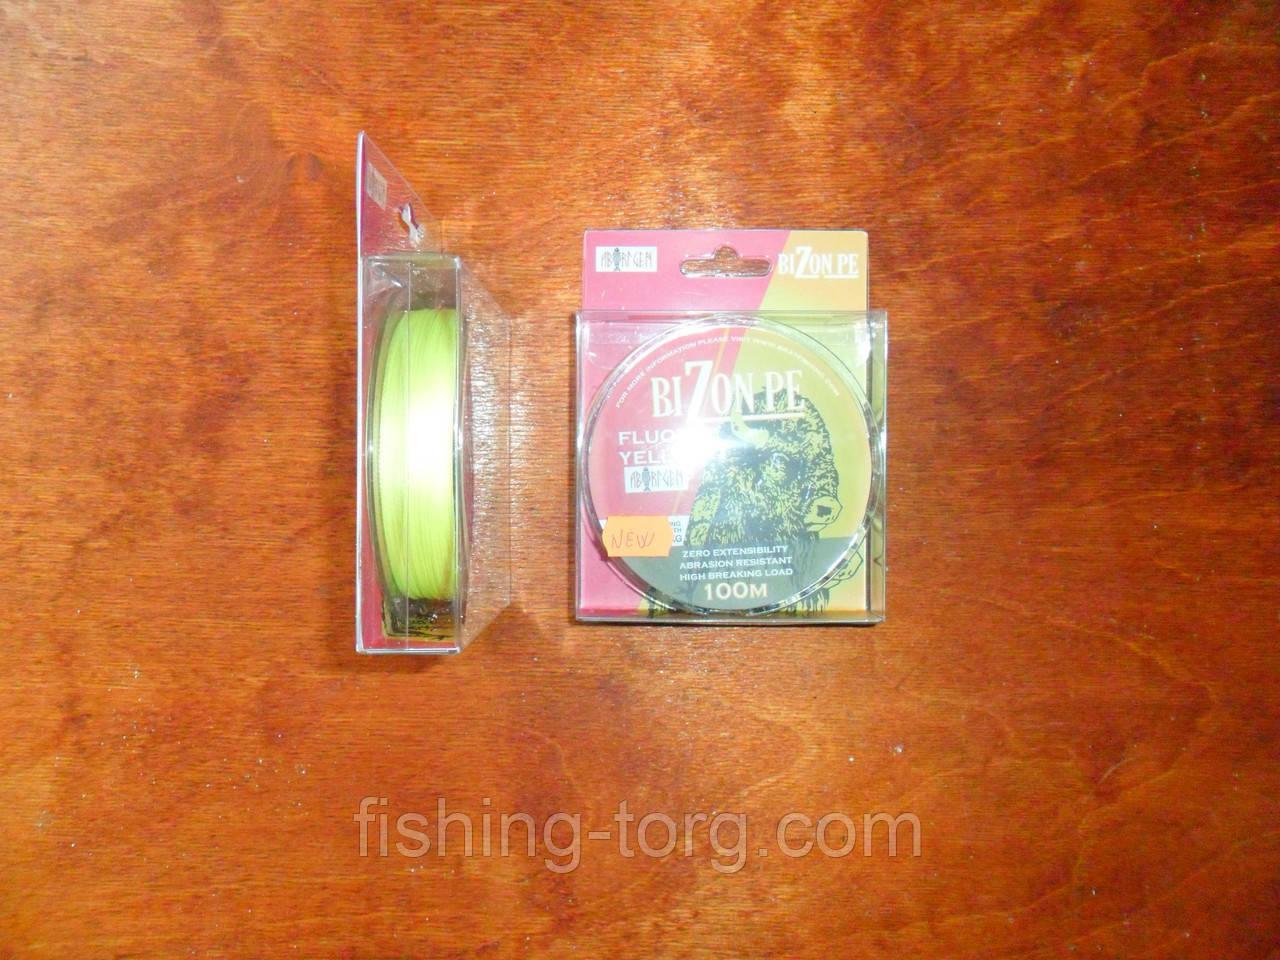 Шнур плетёный bizon pe fluoro yellow  0.14 мм